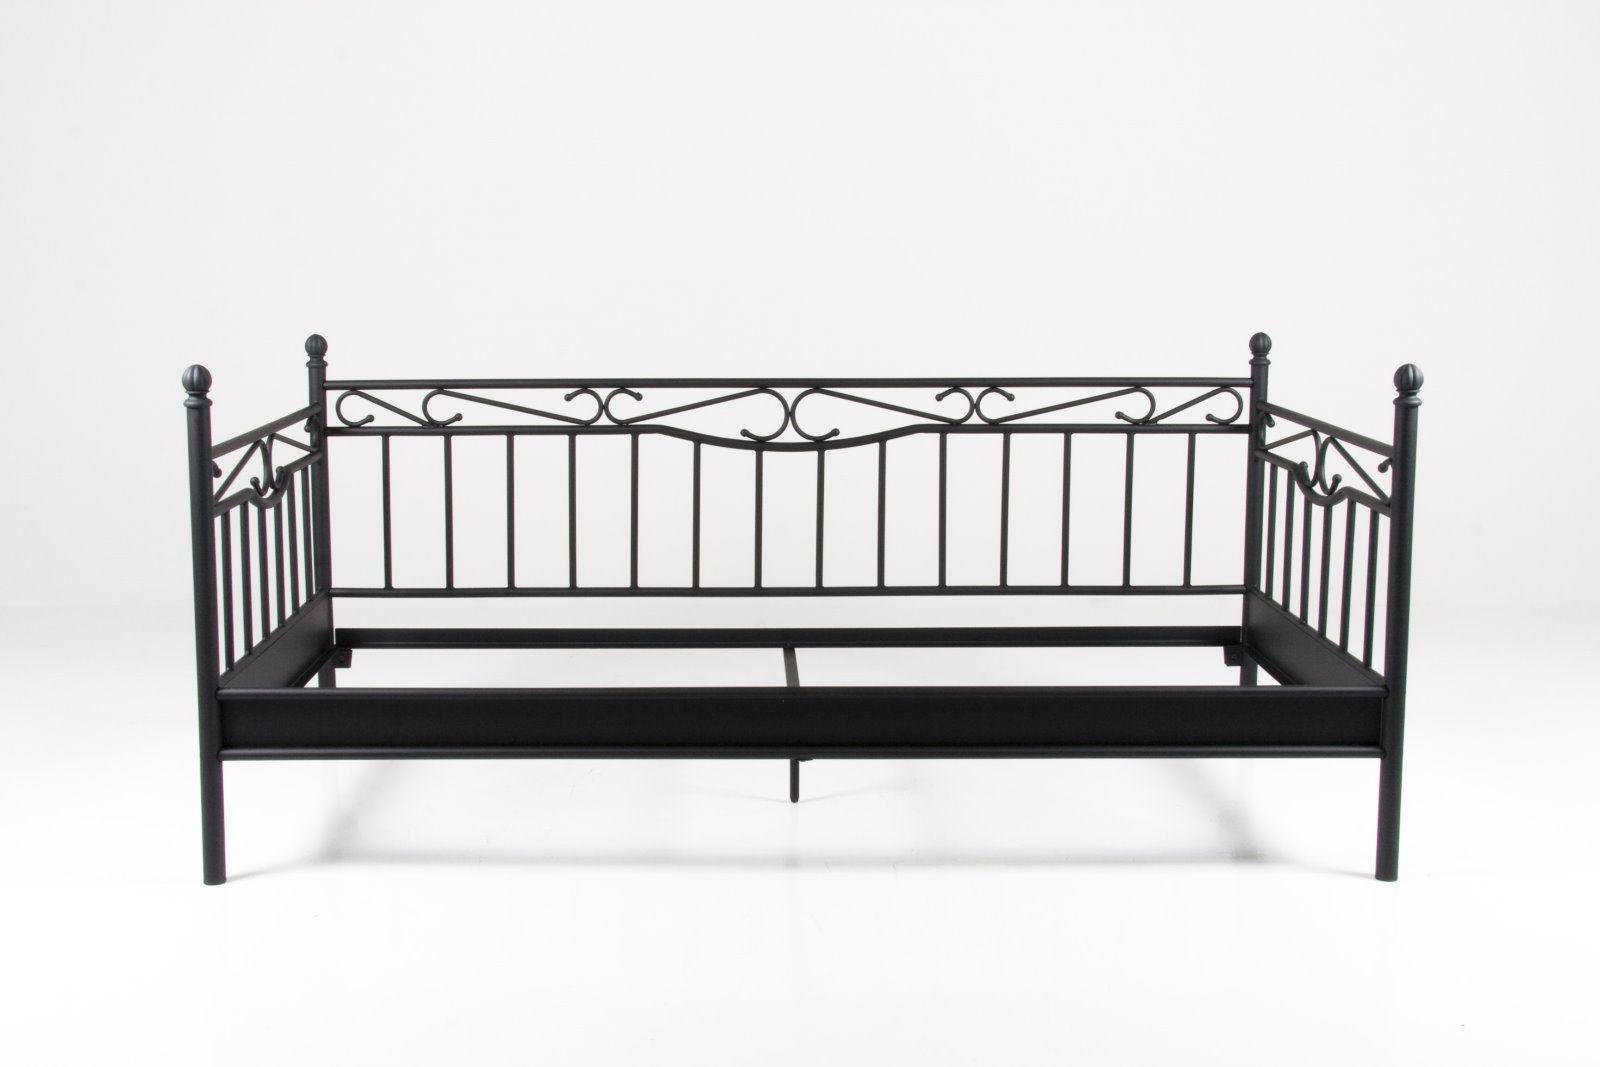 Metallbett schwarz 90x200  PKline Metallbett schwarz 90x200 Bett Jugendbett Kinderbett ...